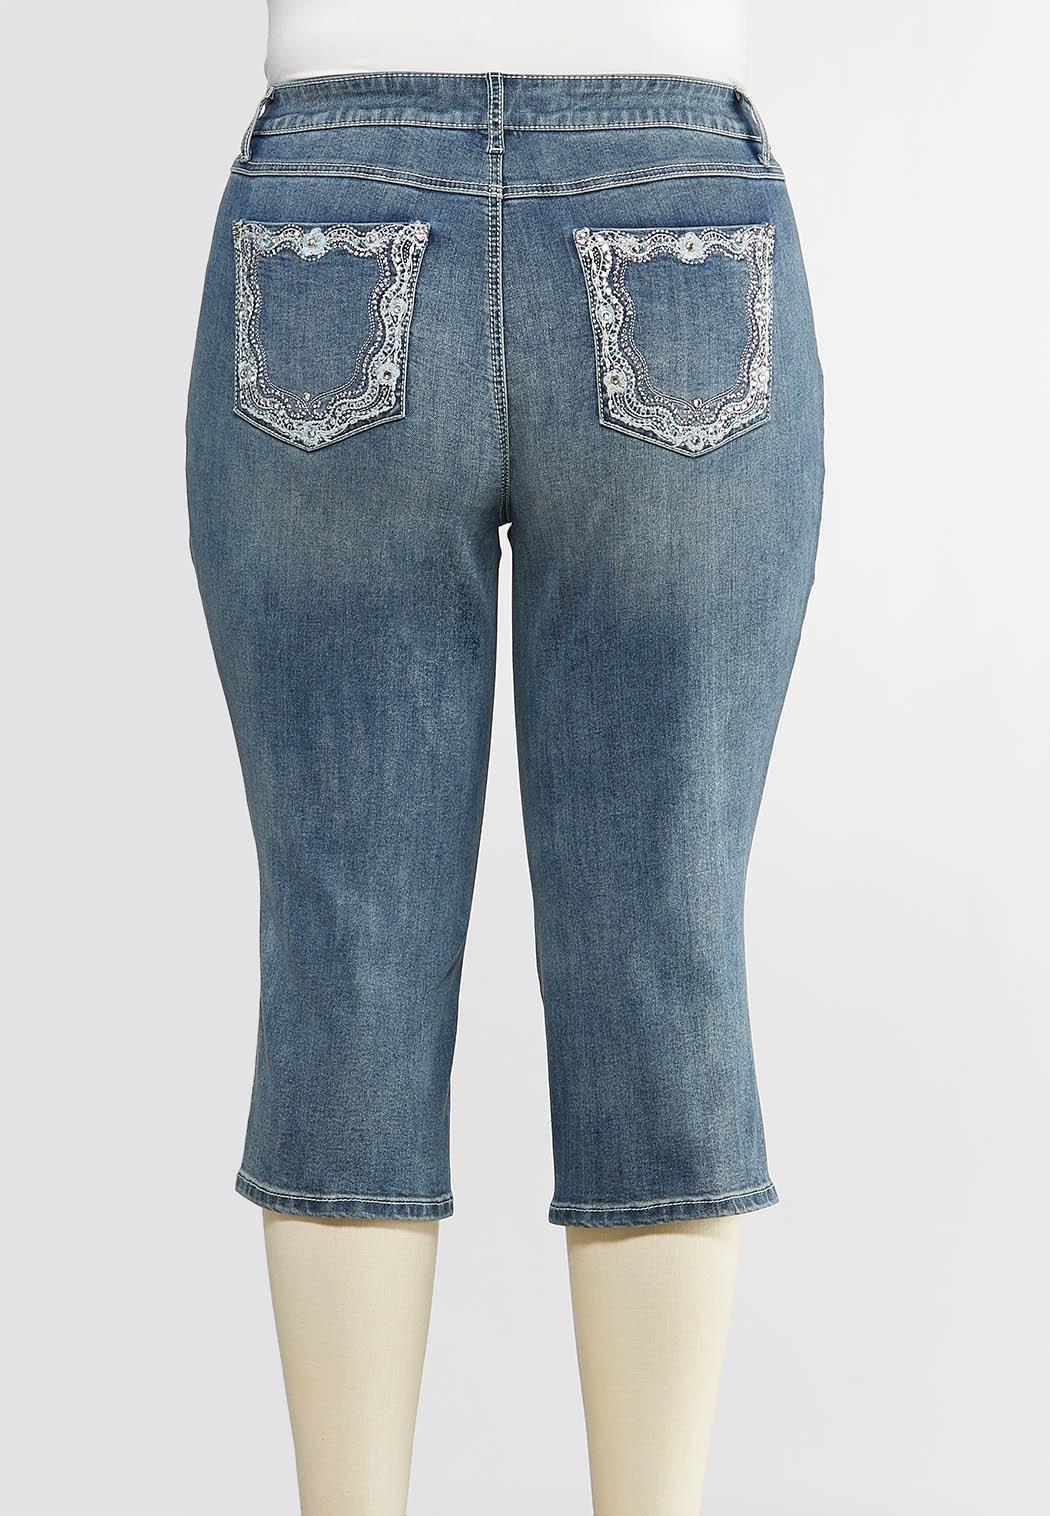 a3c5e60c7103 Plus Size Women's Clothing | Affordable Fashion for Plus Sizes